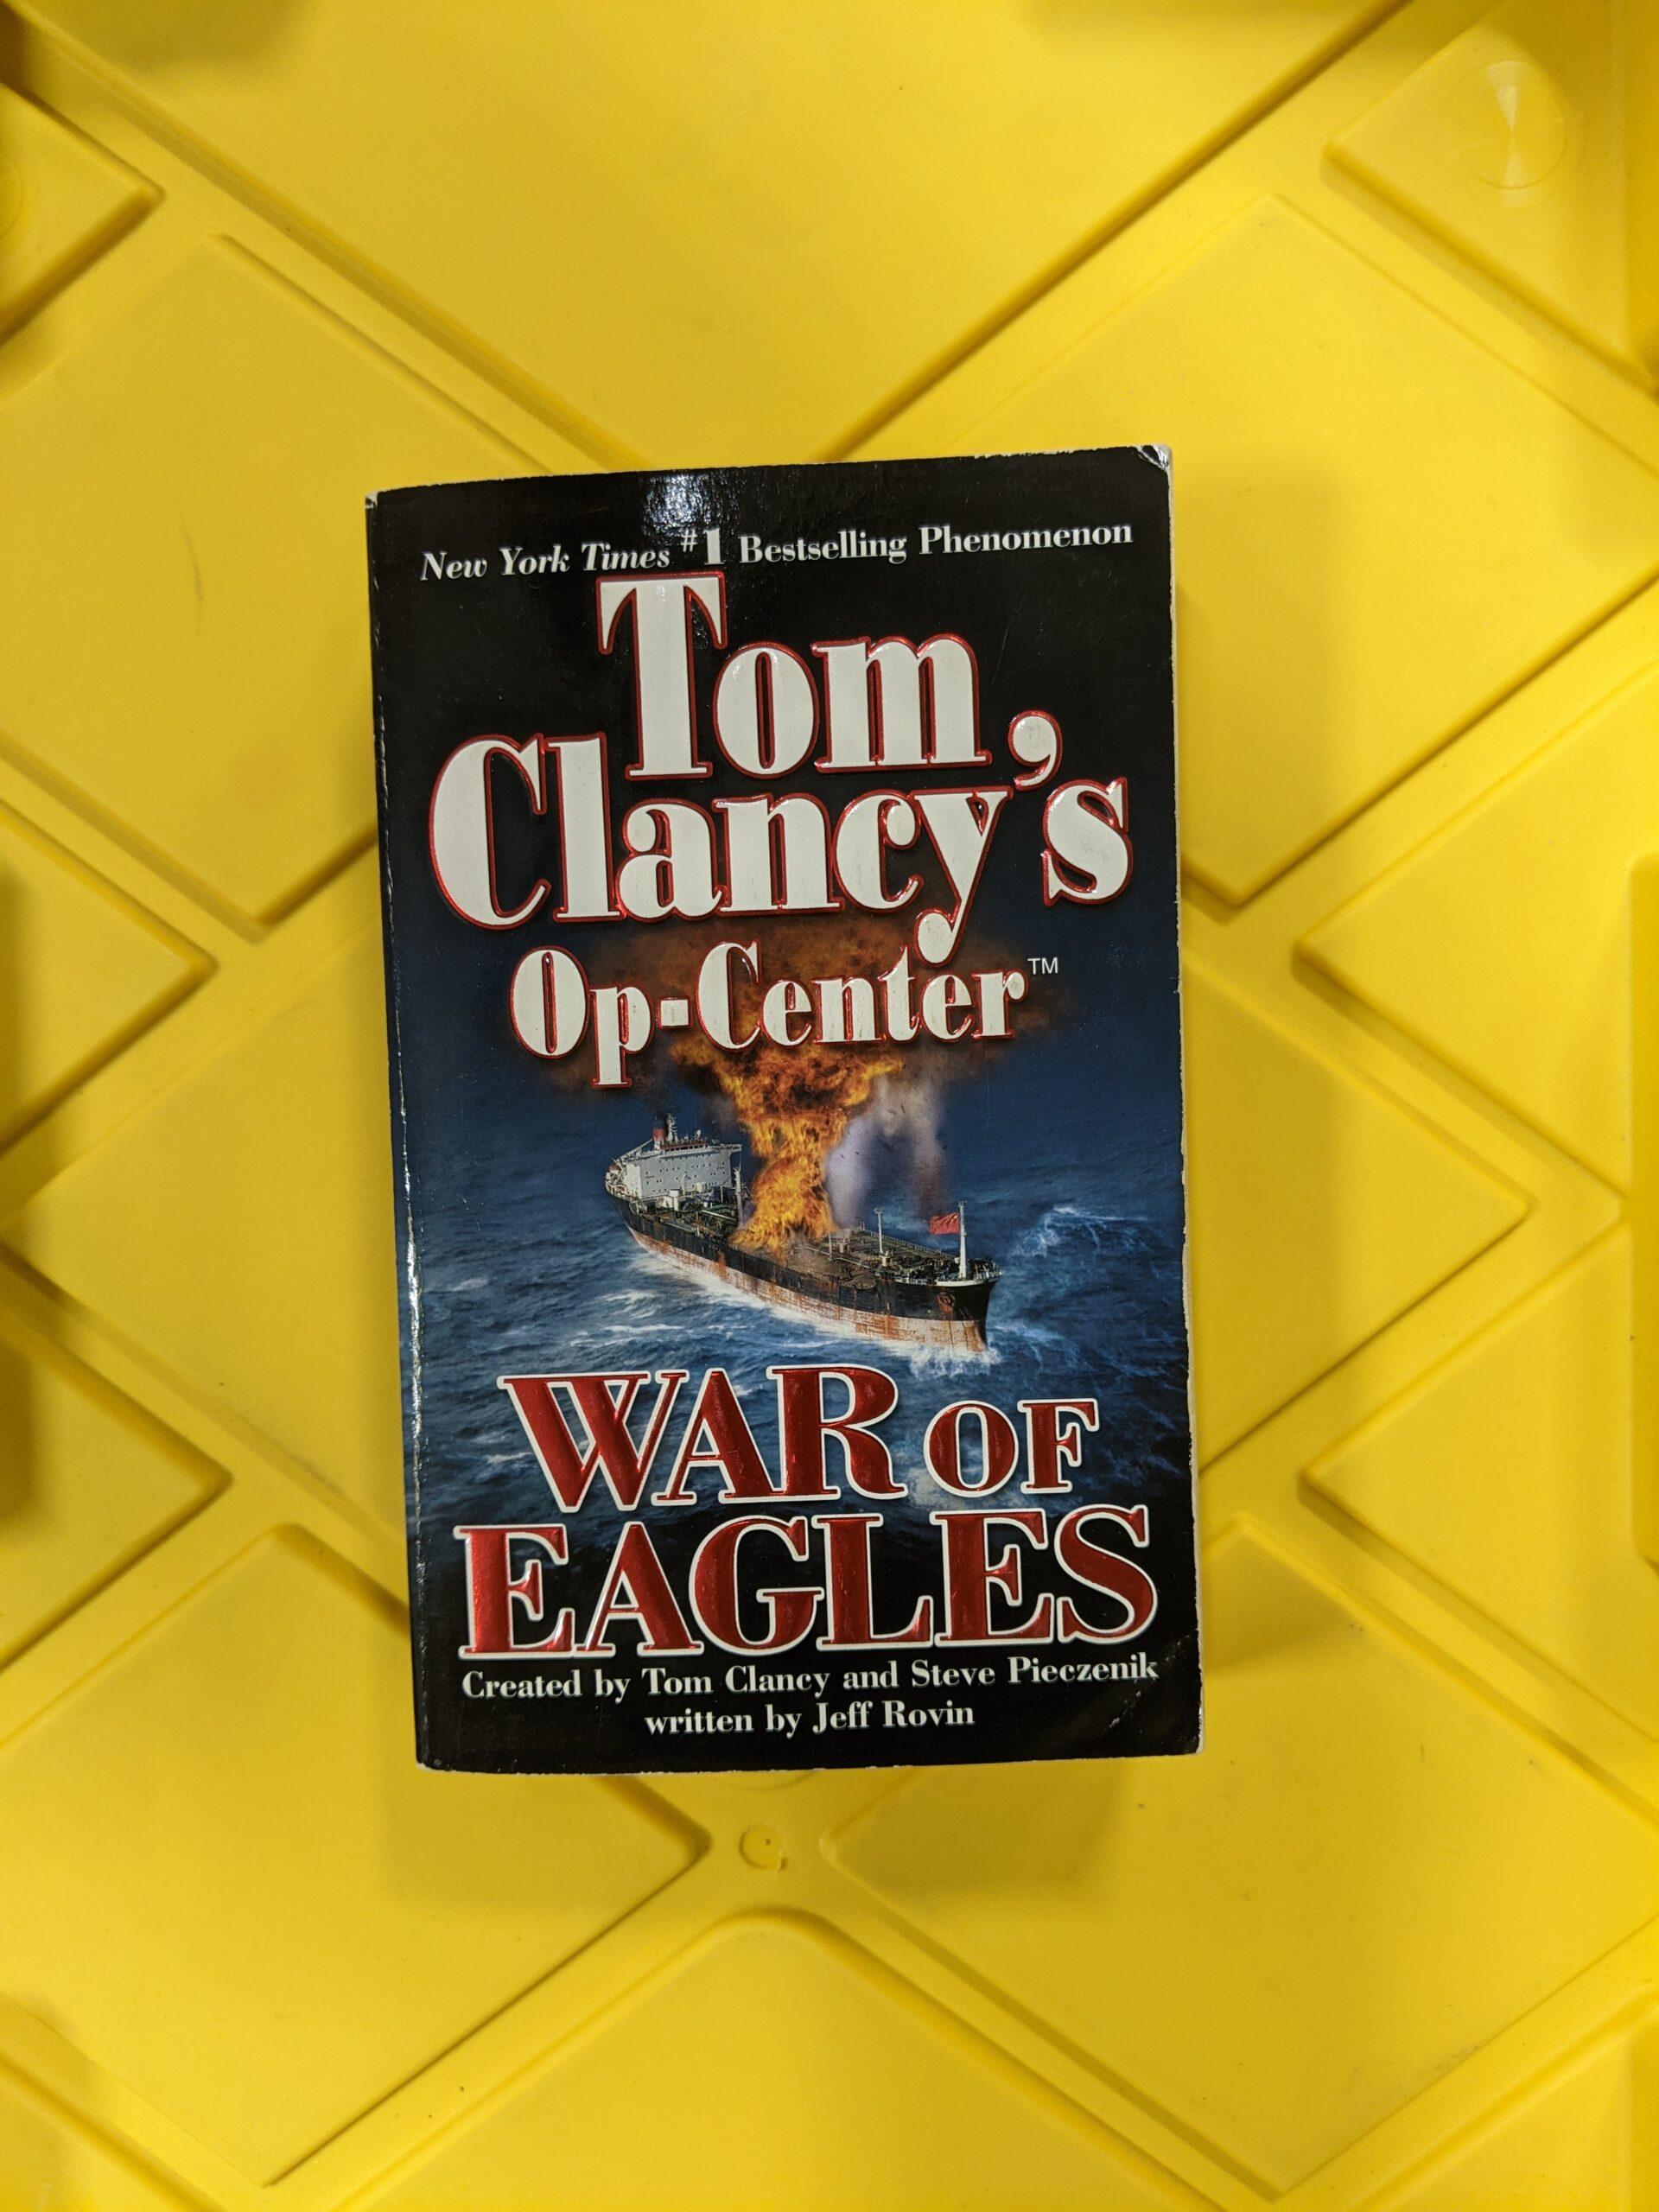 Tom Clancy's Op-Center: War Of Eagles by Jeff Rovin 2005